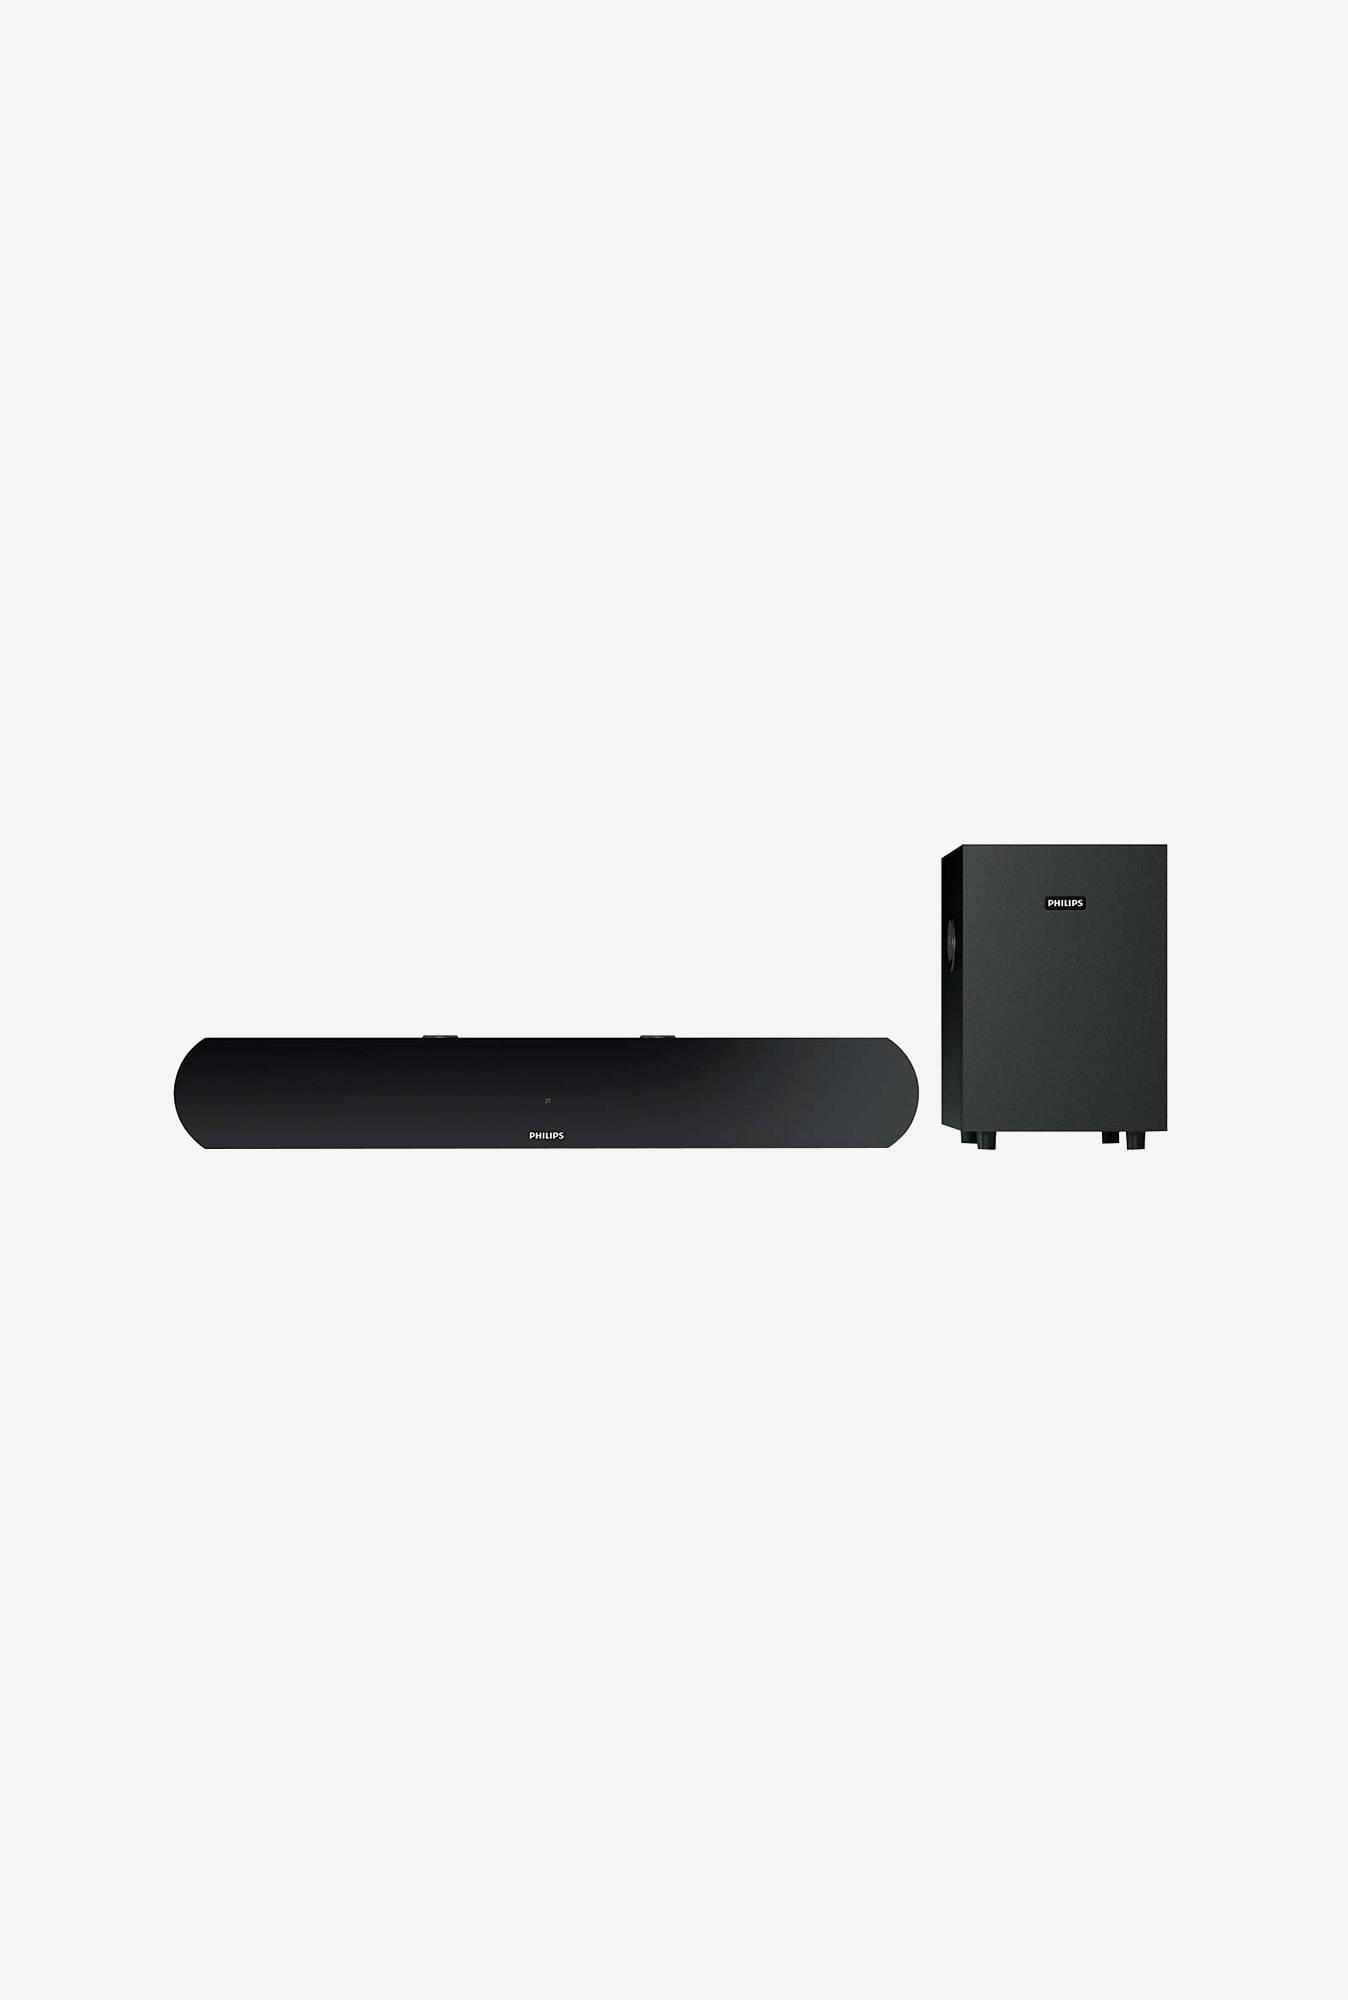 Philips HTL1031/94 2.1 Channel Soundbar Speaker (Black)